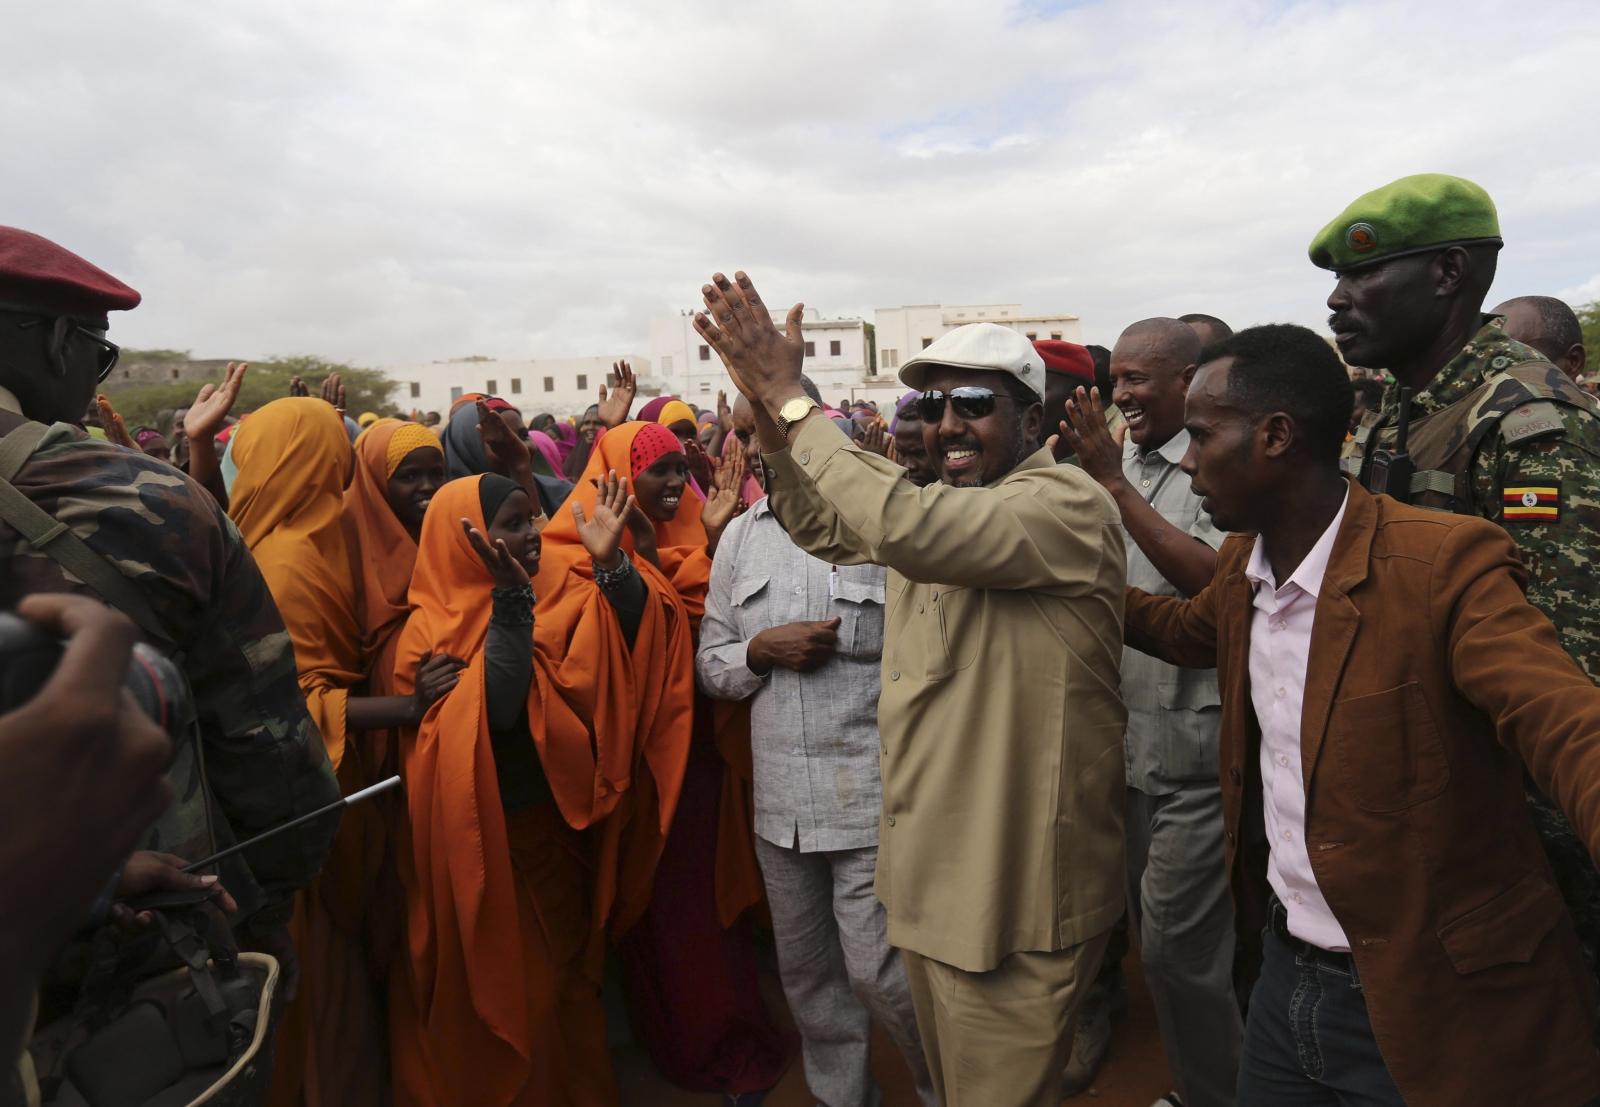 Somalia President Hassan Sheikh Mohamud